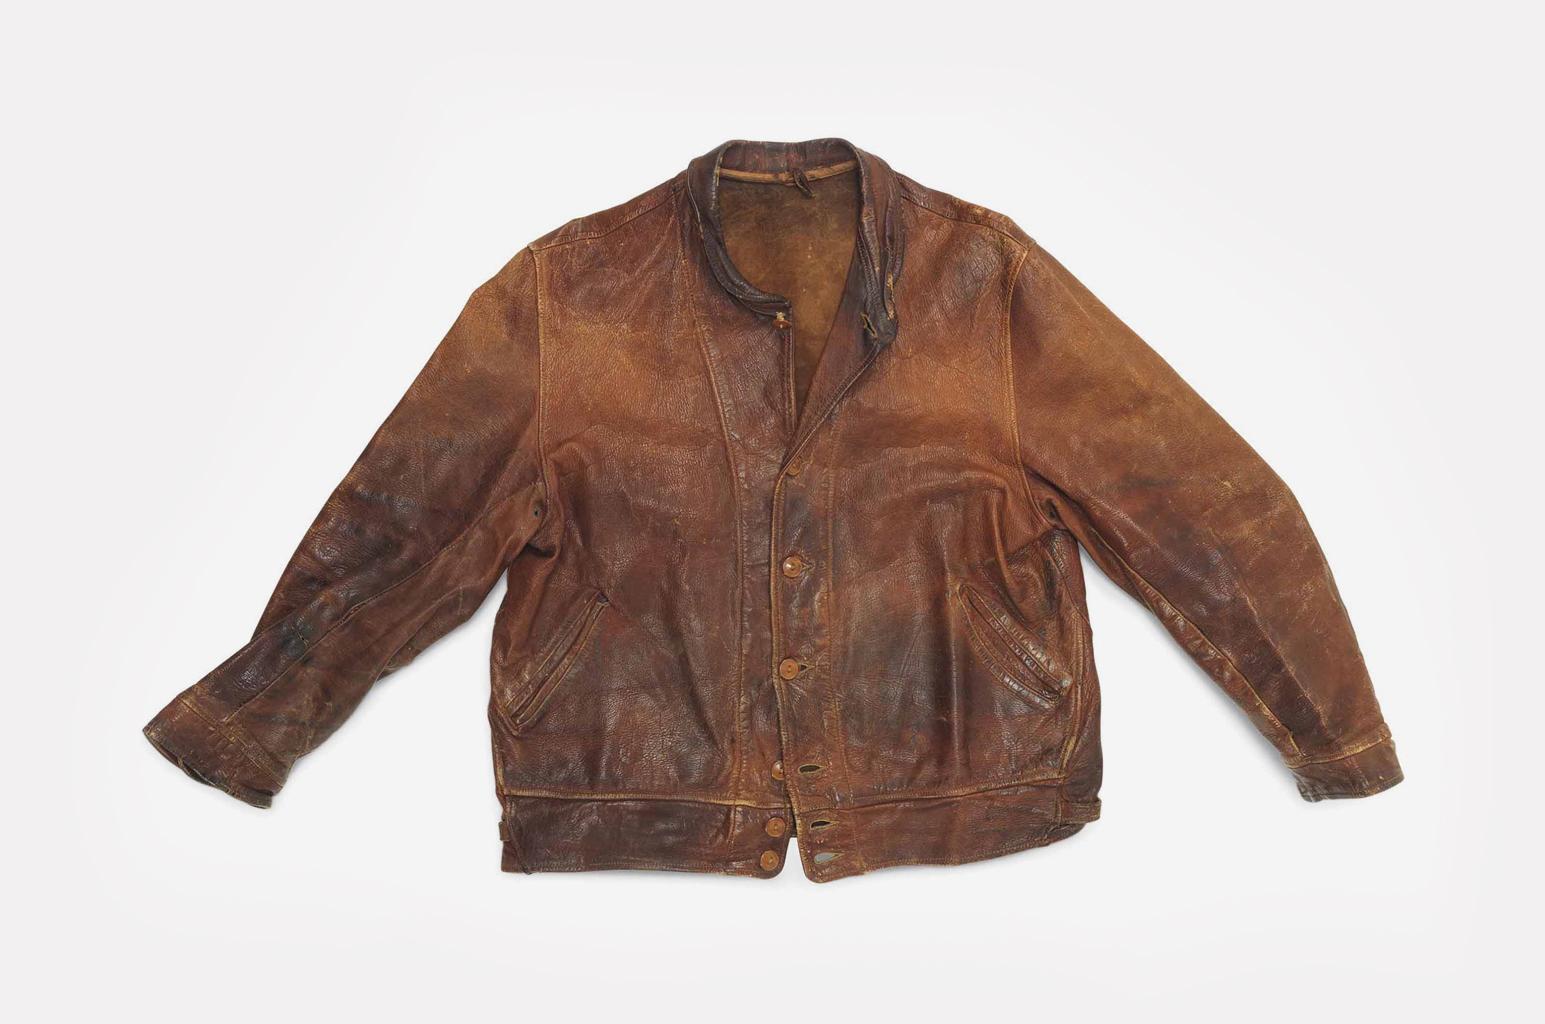 Кожаная куртка «Cossack» Альберта Эйнштейна